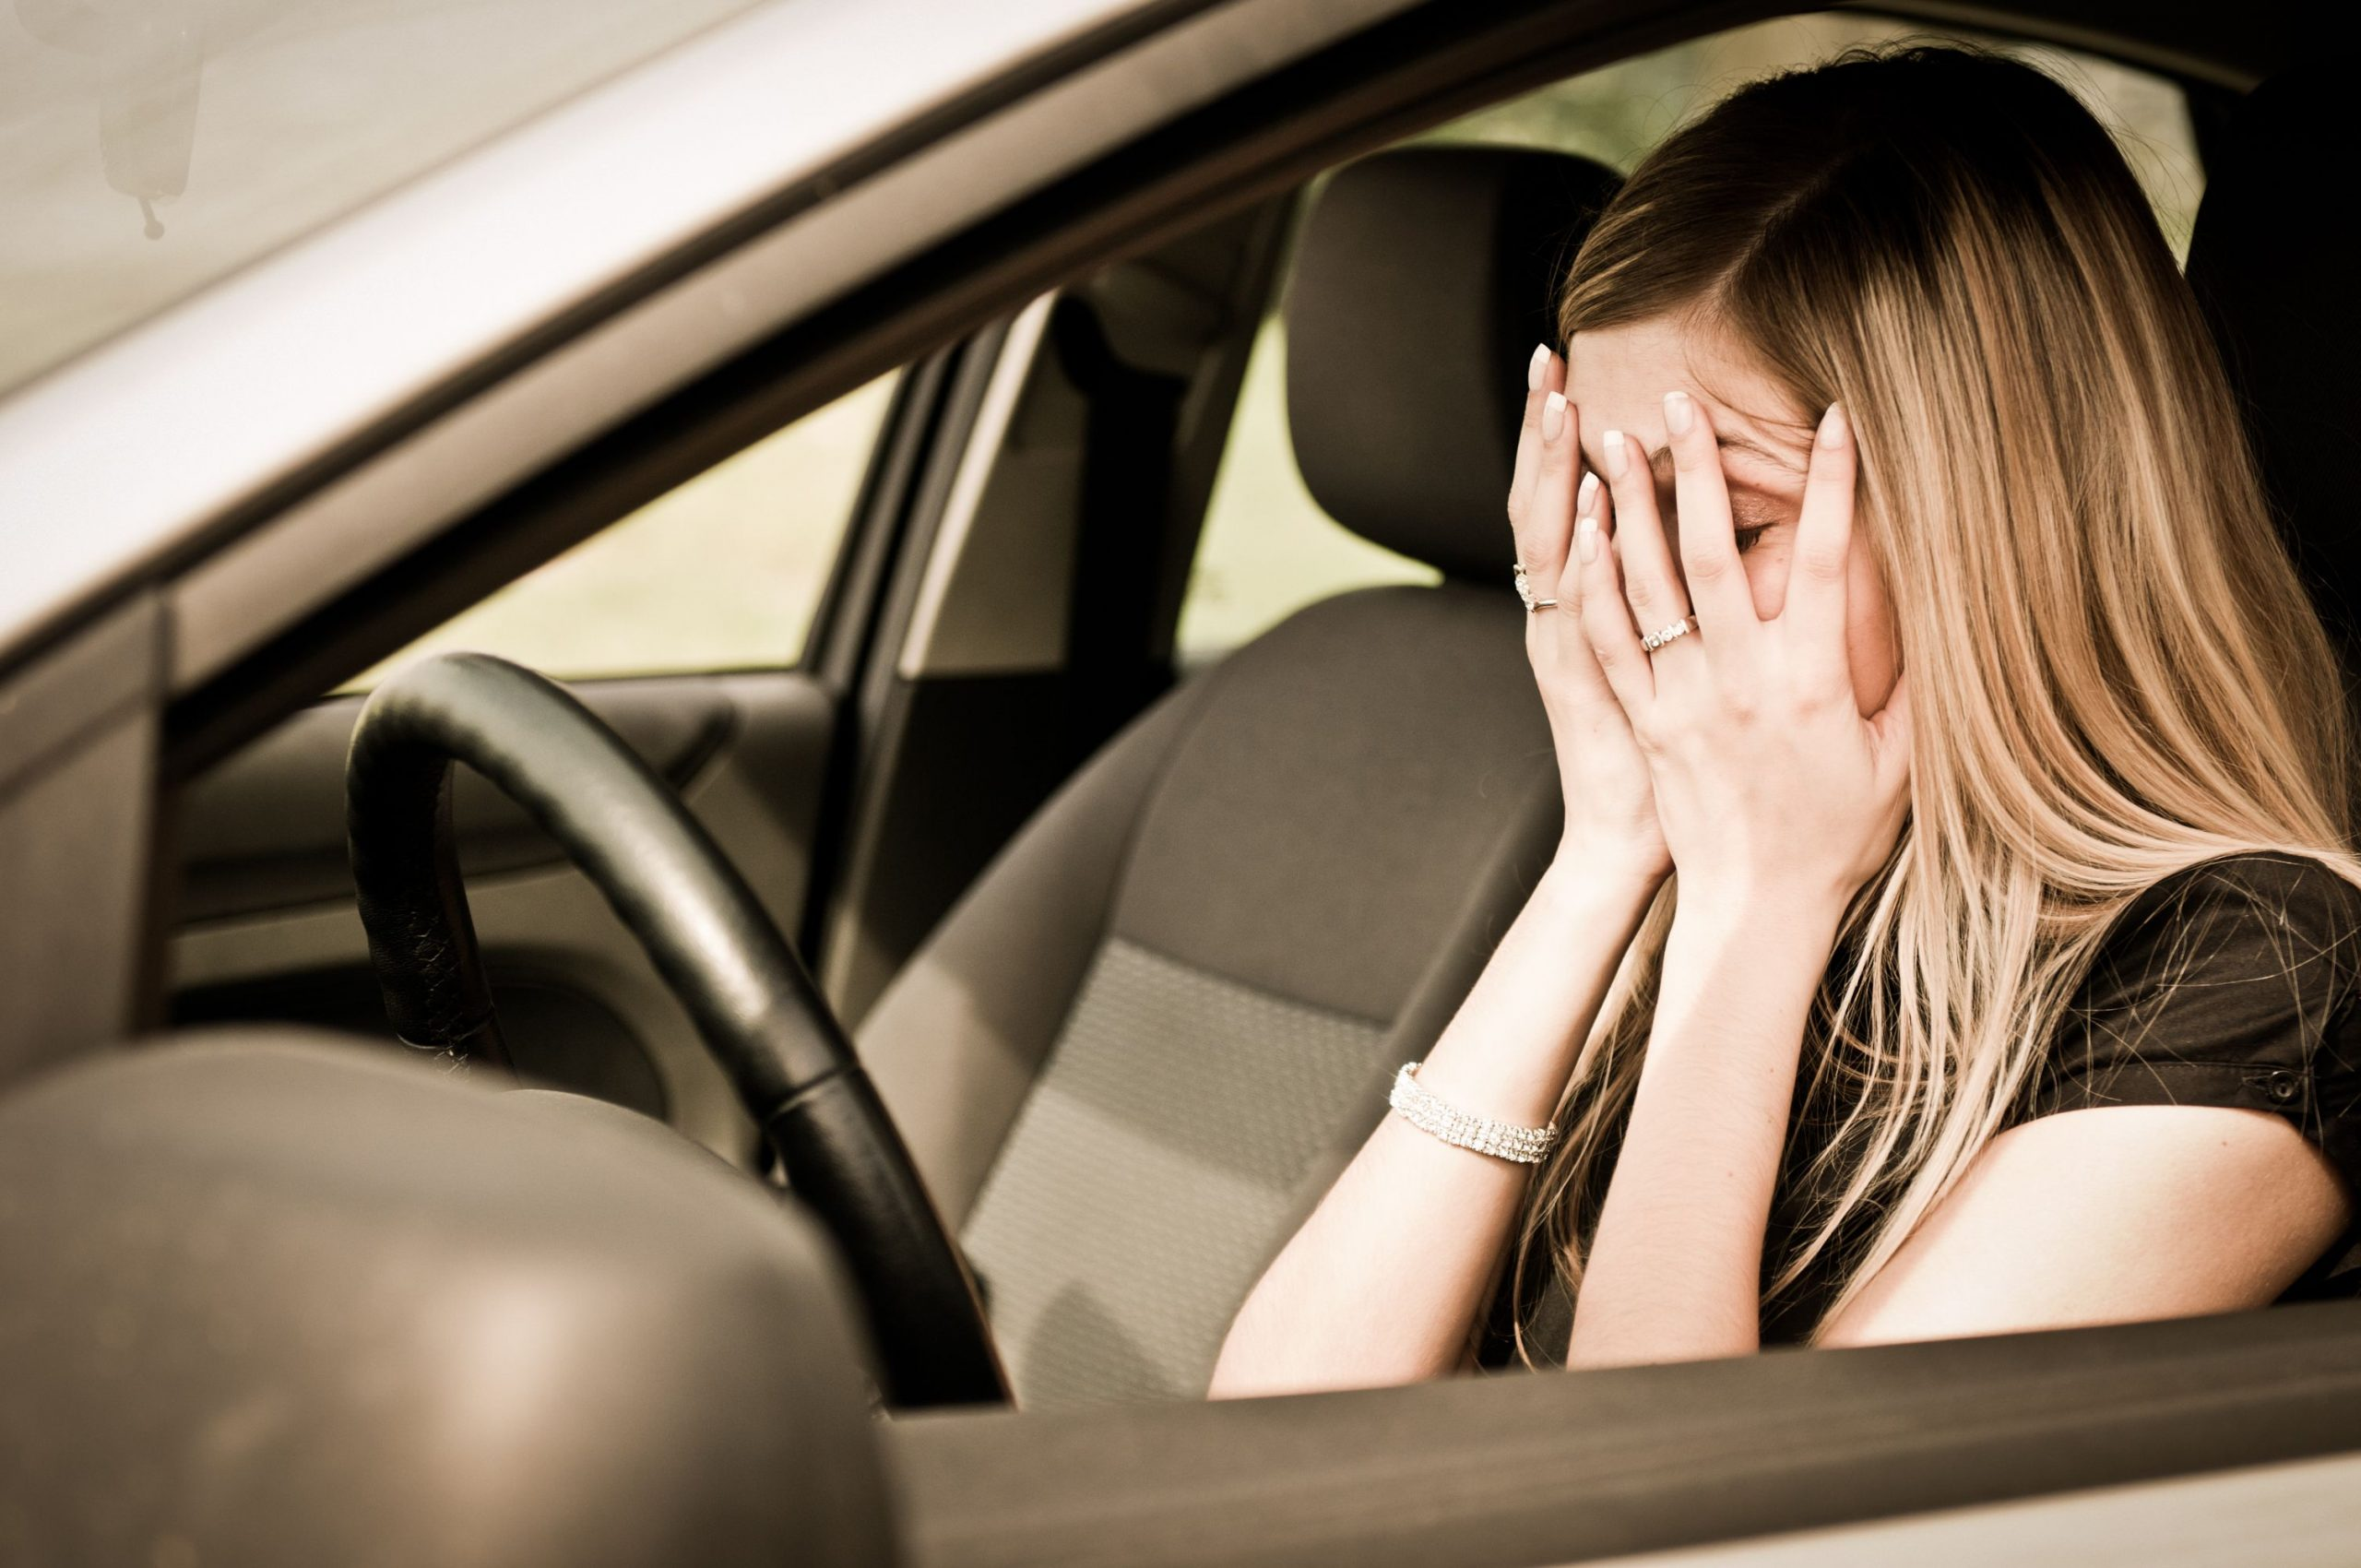 Ошибки женщин за рулем